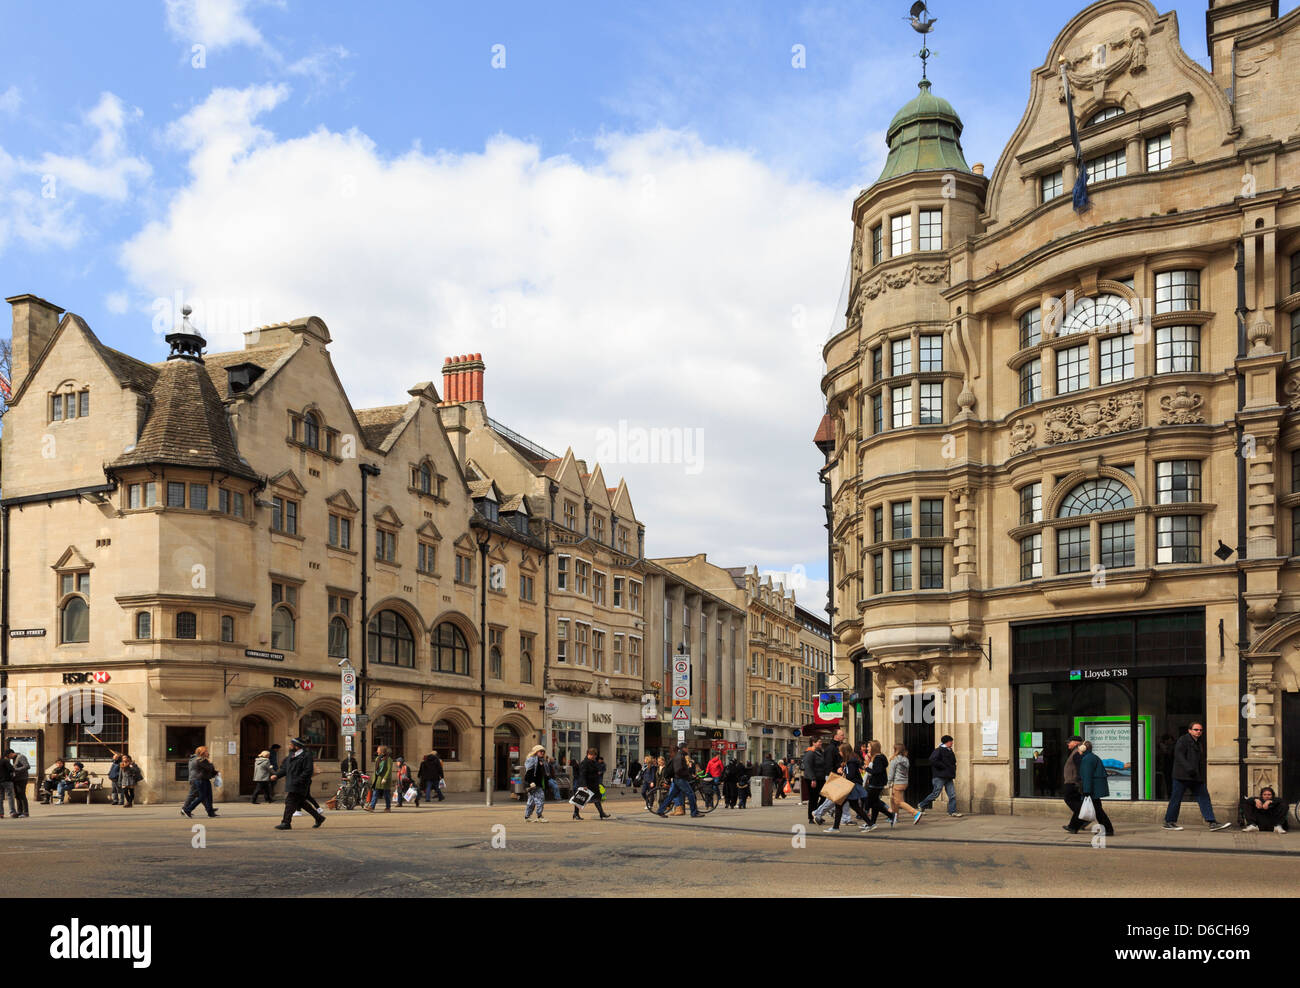 Oxford Oxfordshire England UK  HSBC and Lloyds TSB Banks on junction